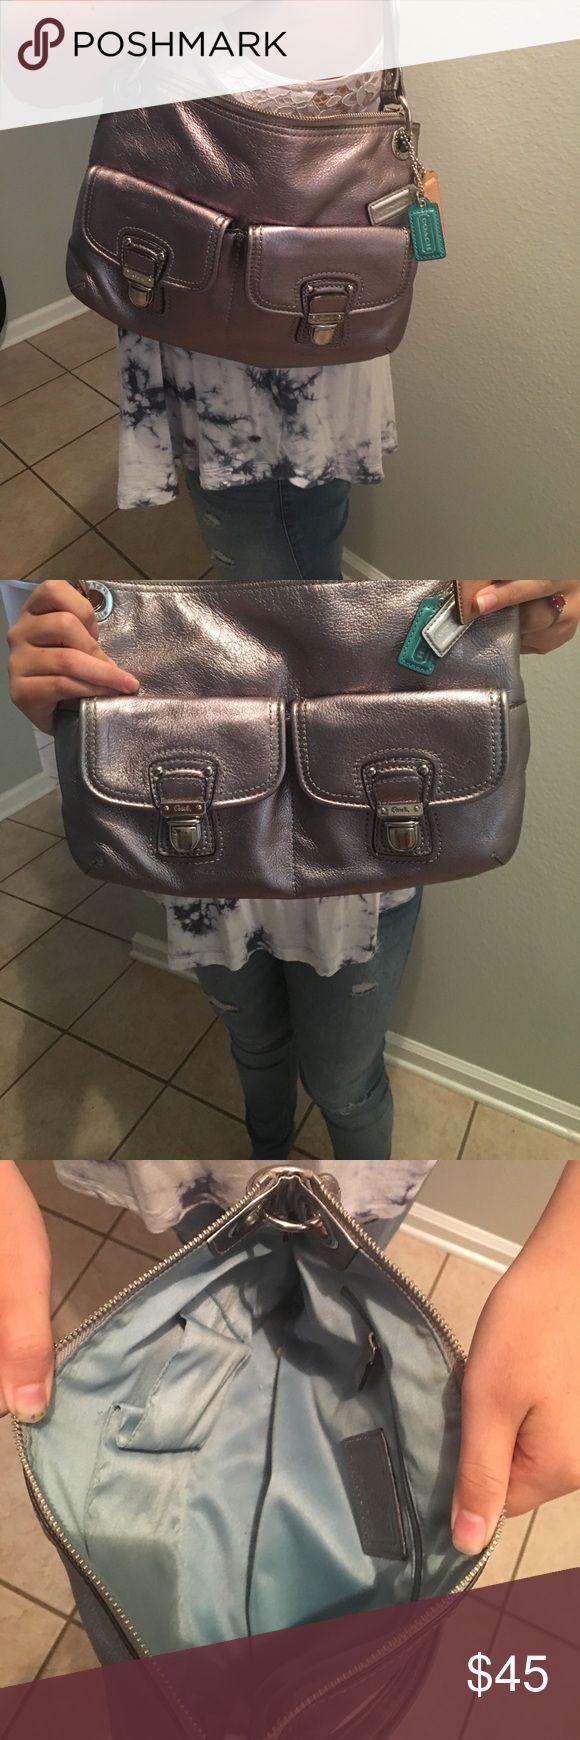 Coach Metallic Silver Handbag Great Handbag metallic Coach Bags Shoulder Bags